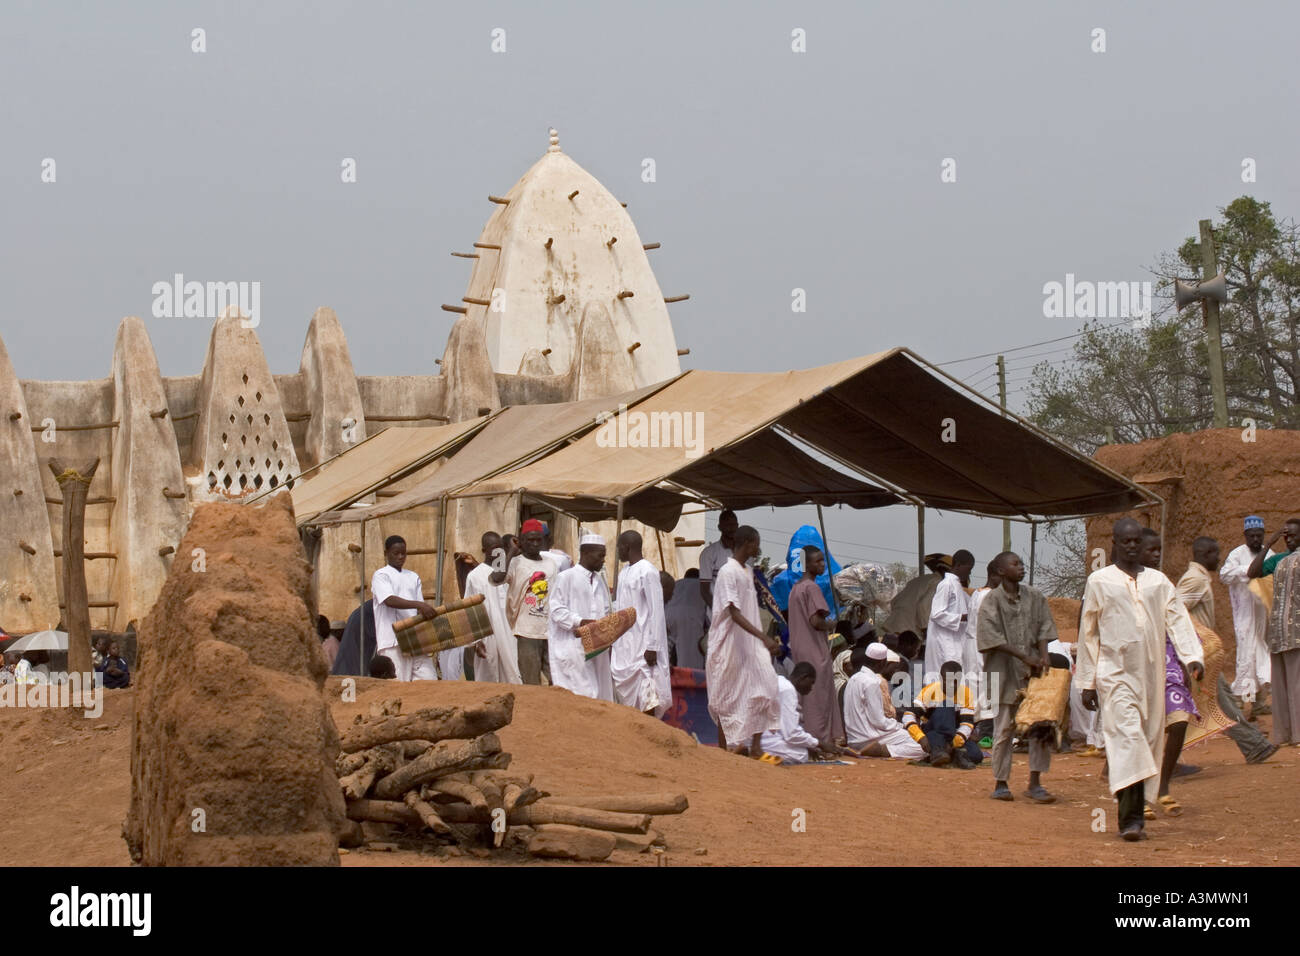 Village worshippers leaving Larabanga Mosque after Friday Prayers, Larabanga, Northern Ghana. - Stock Image